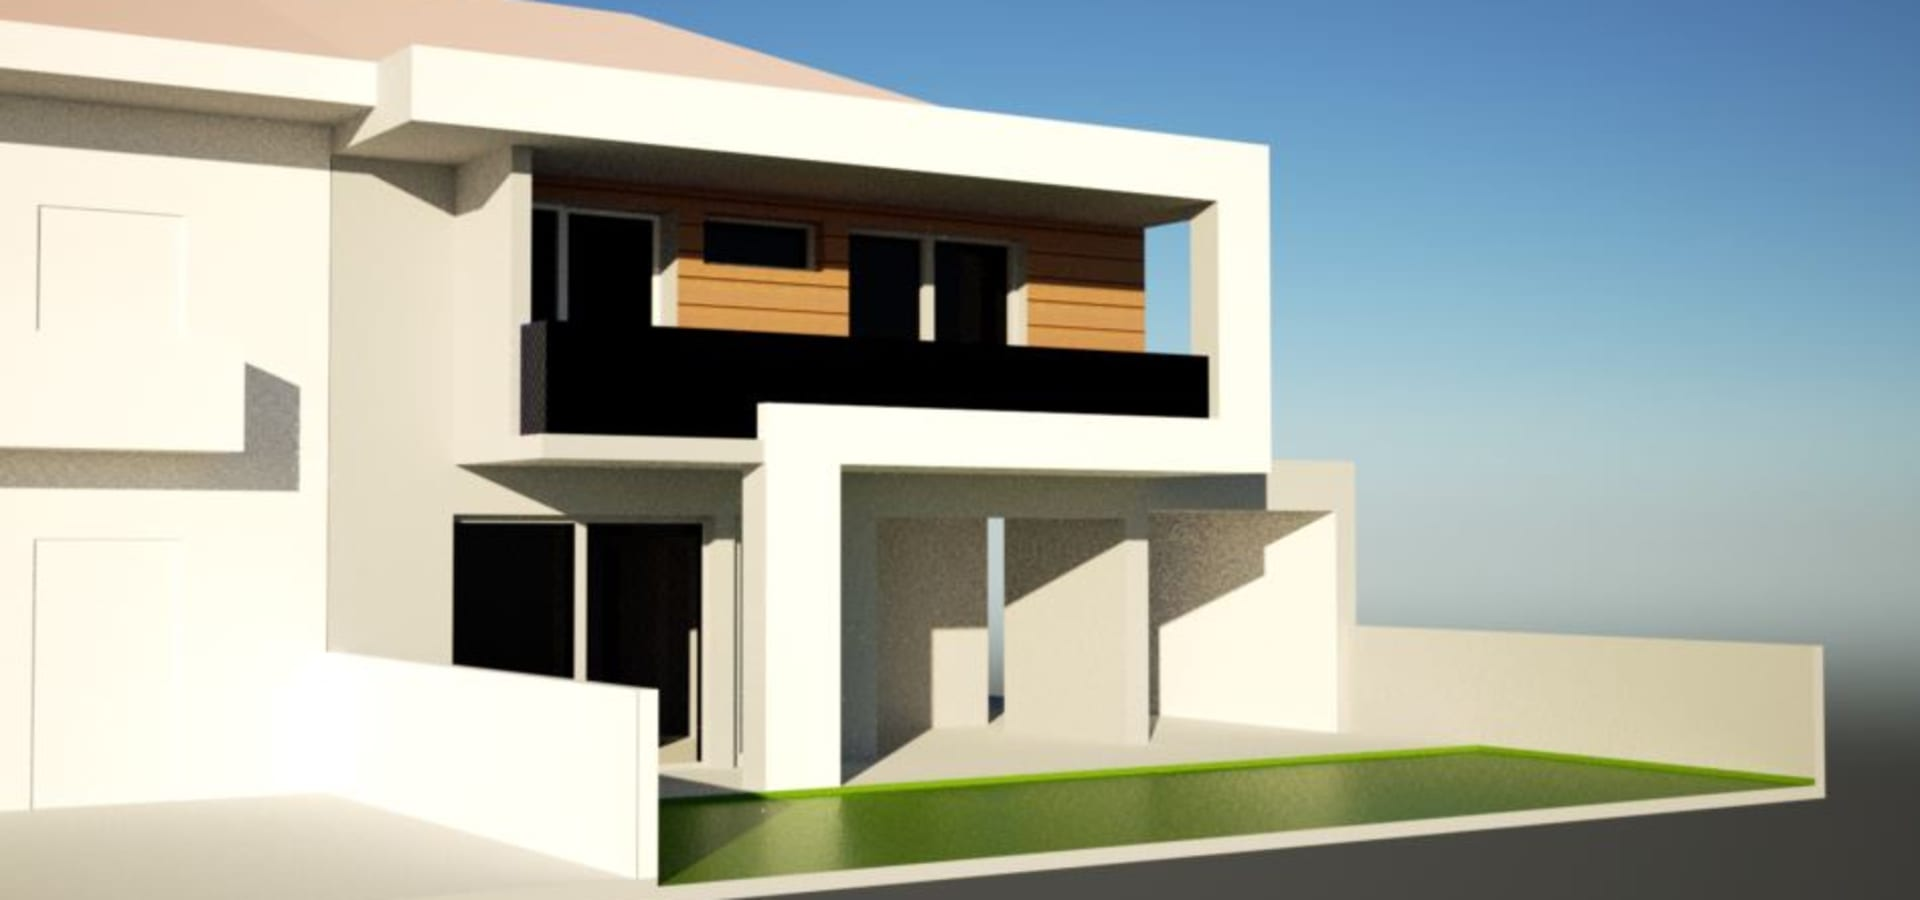 askarquitetura